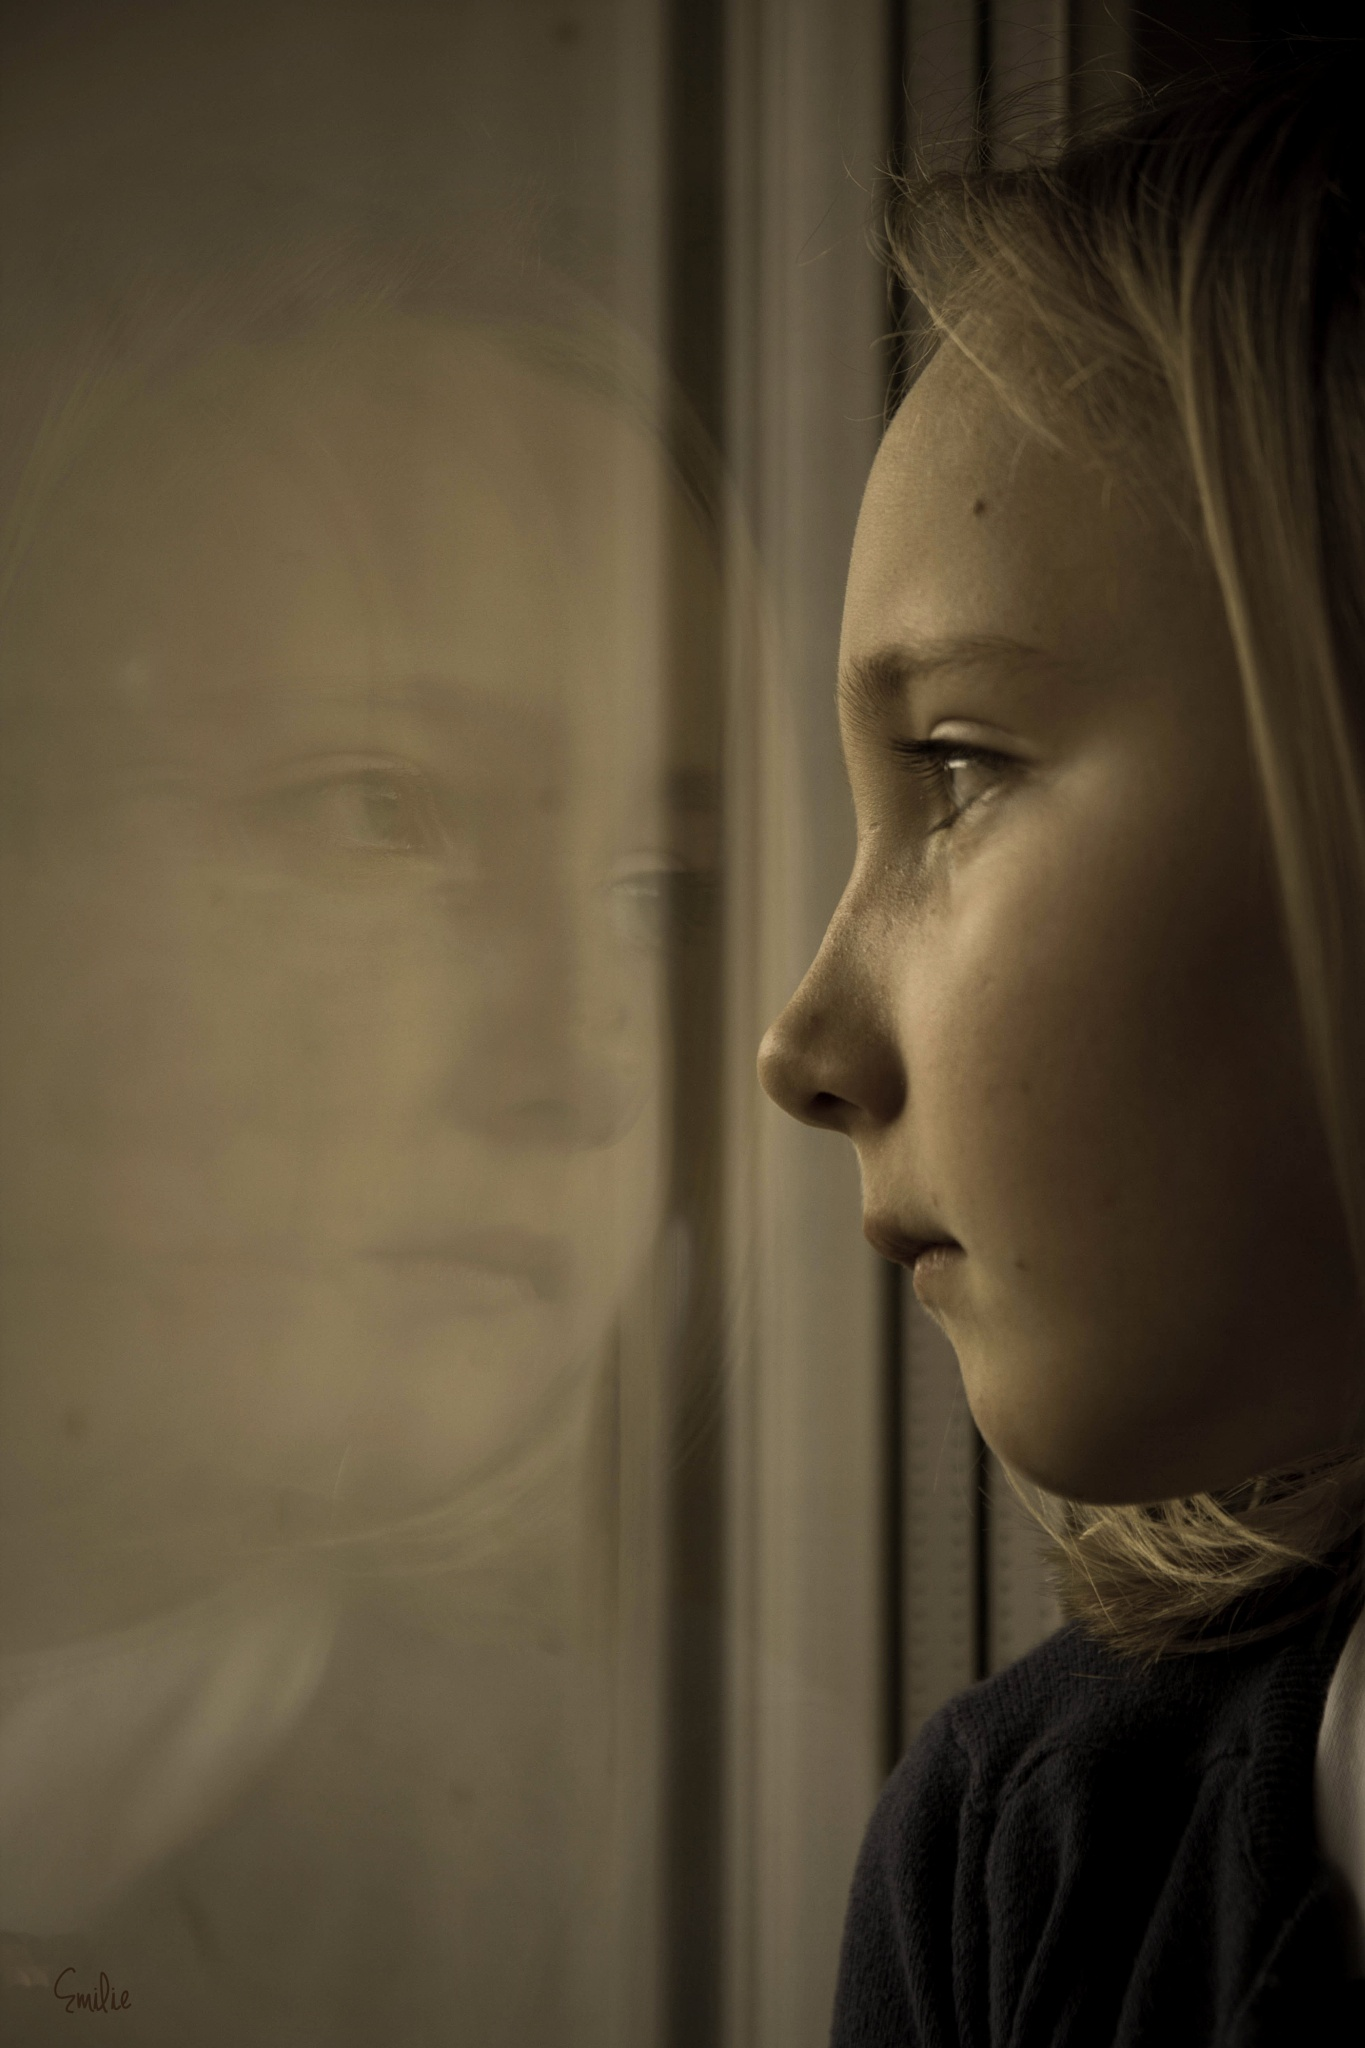 la fille à la fenêtre by EmilyBy